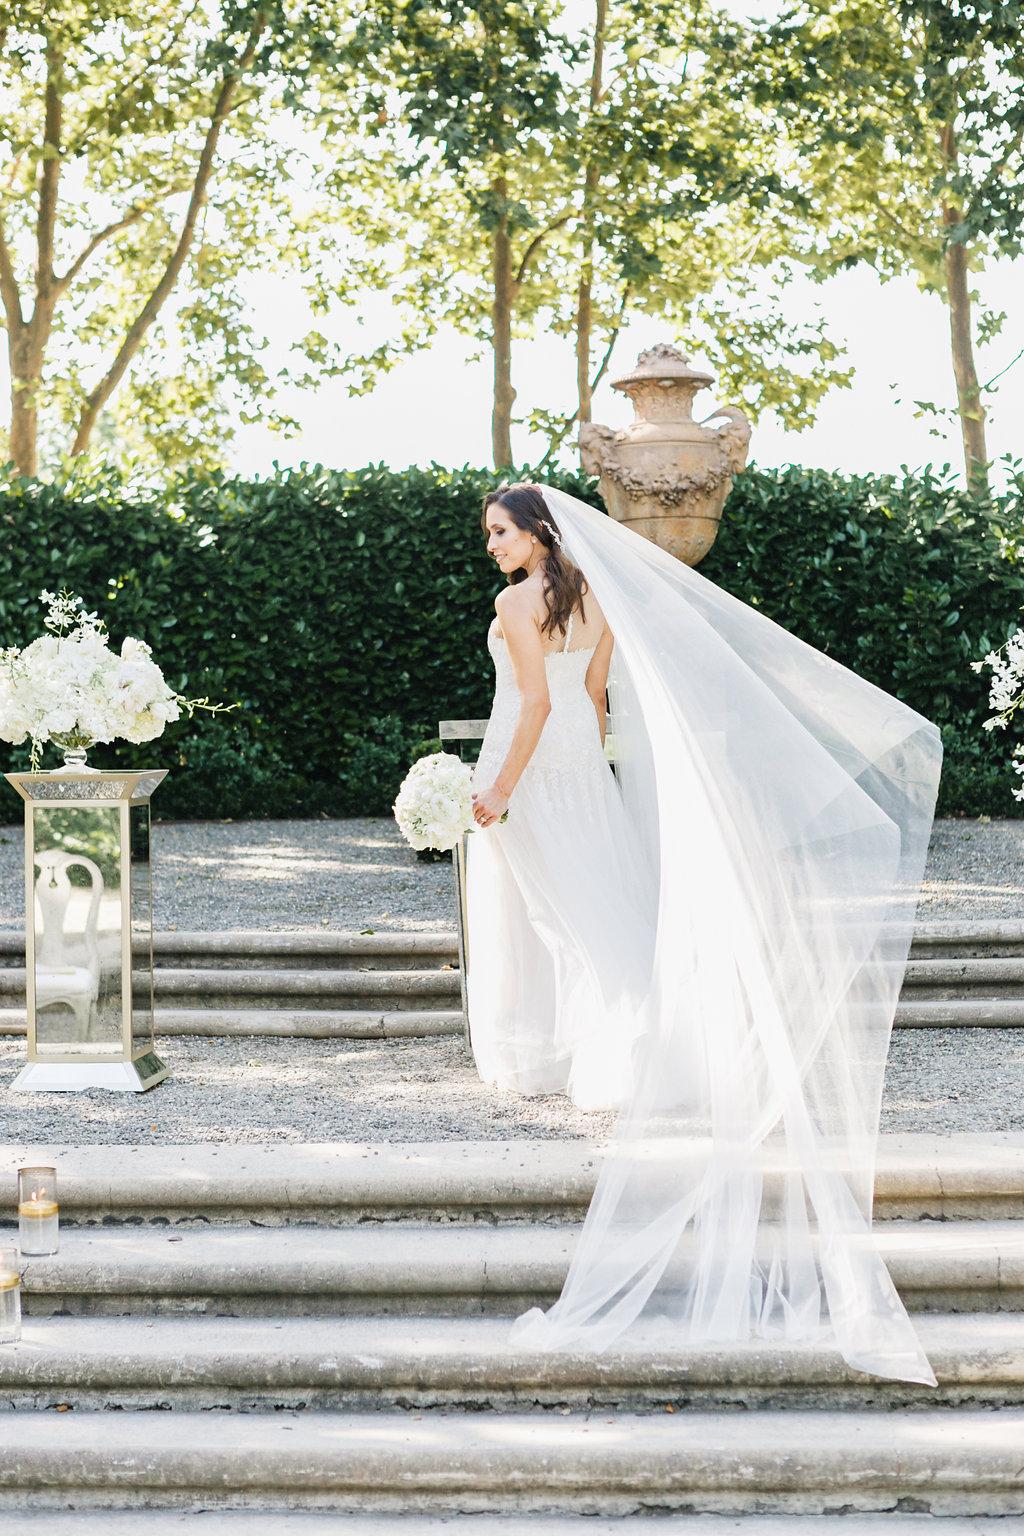 Beaulieu Garden, Napa Wedding, Reem Acra wedding dress and veil